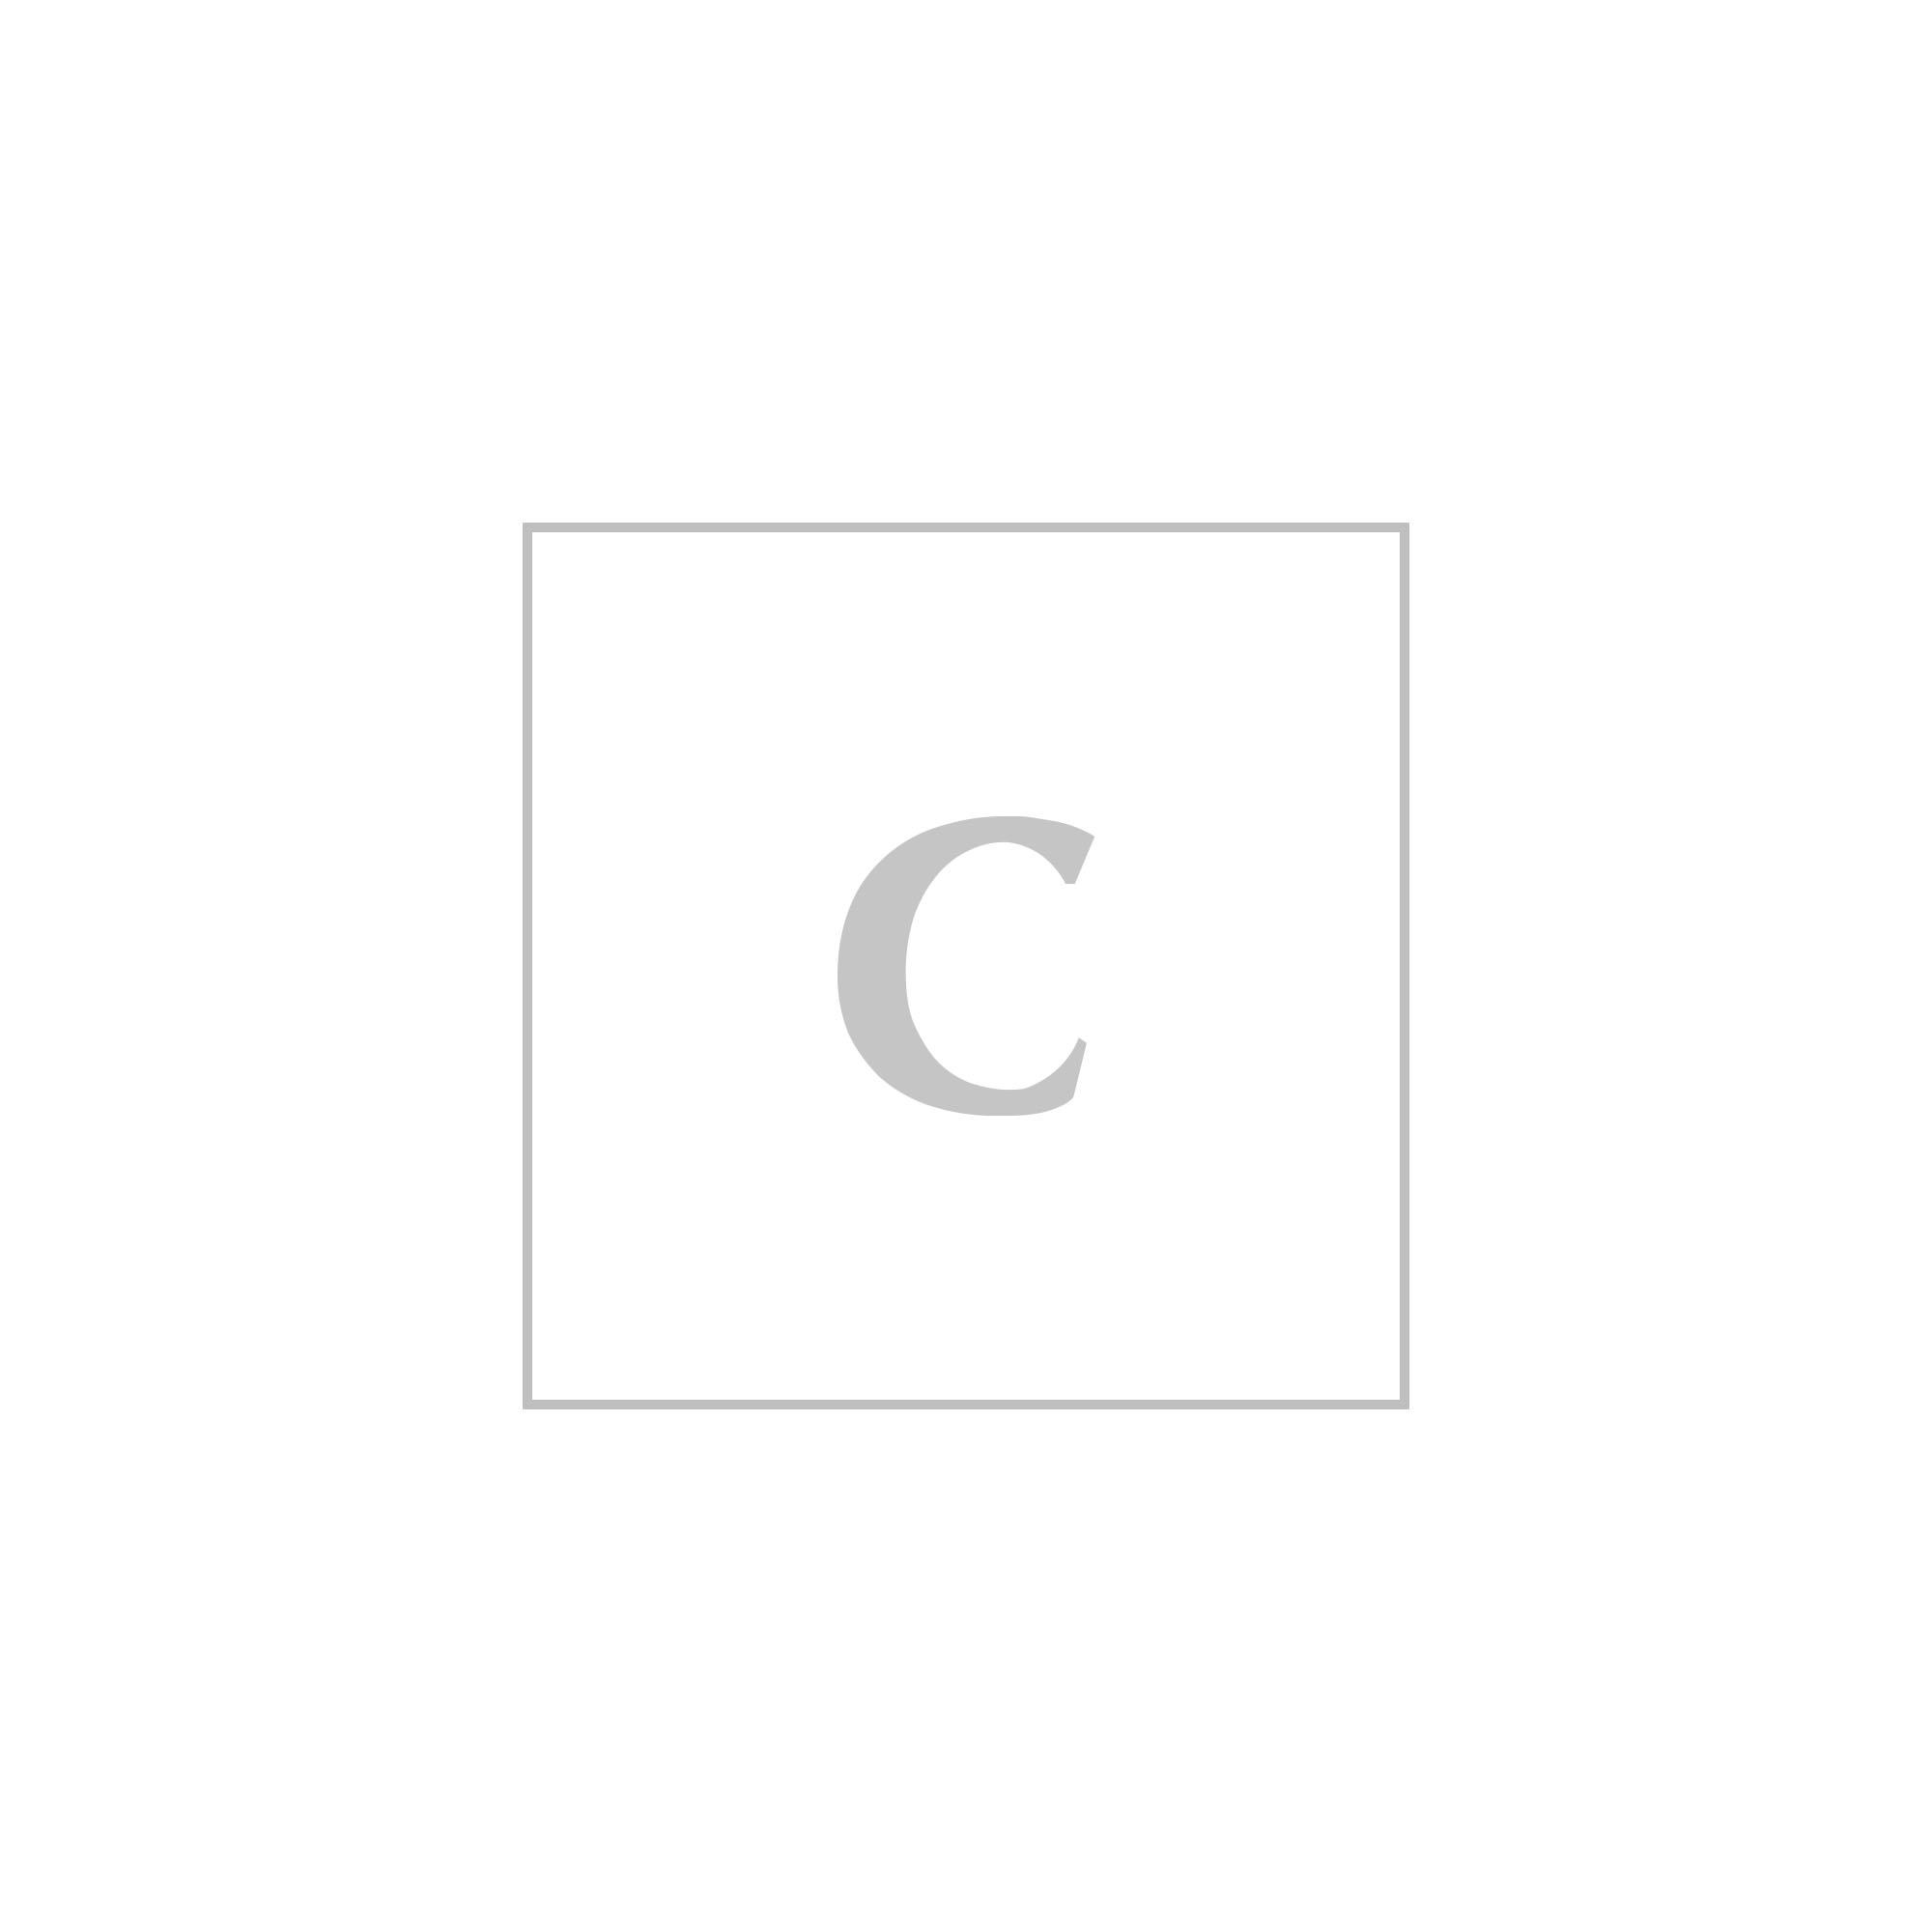 Burberry cartella hambleton